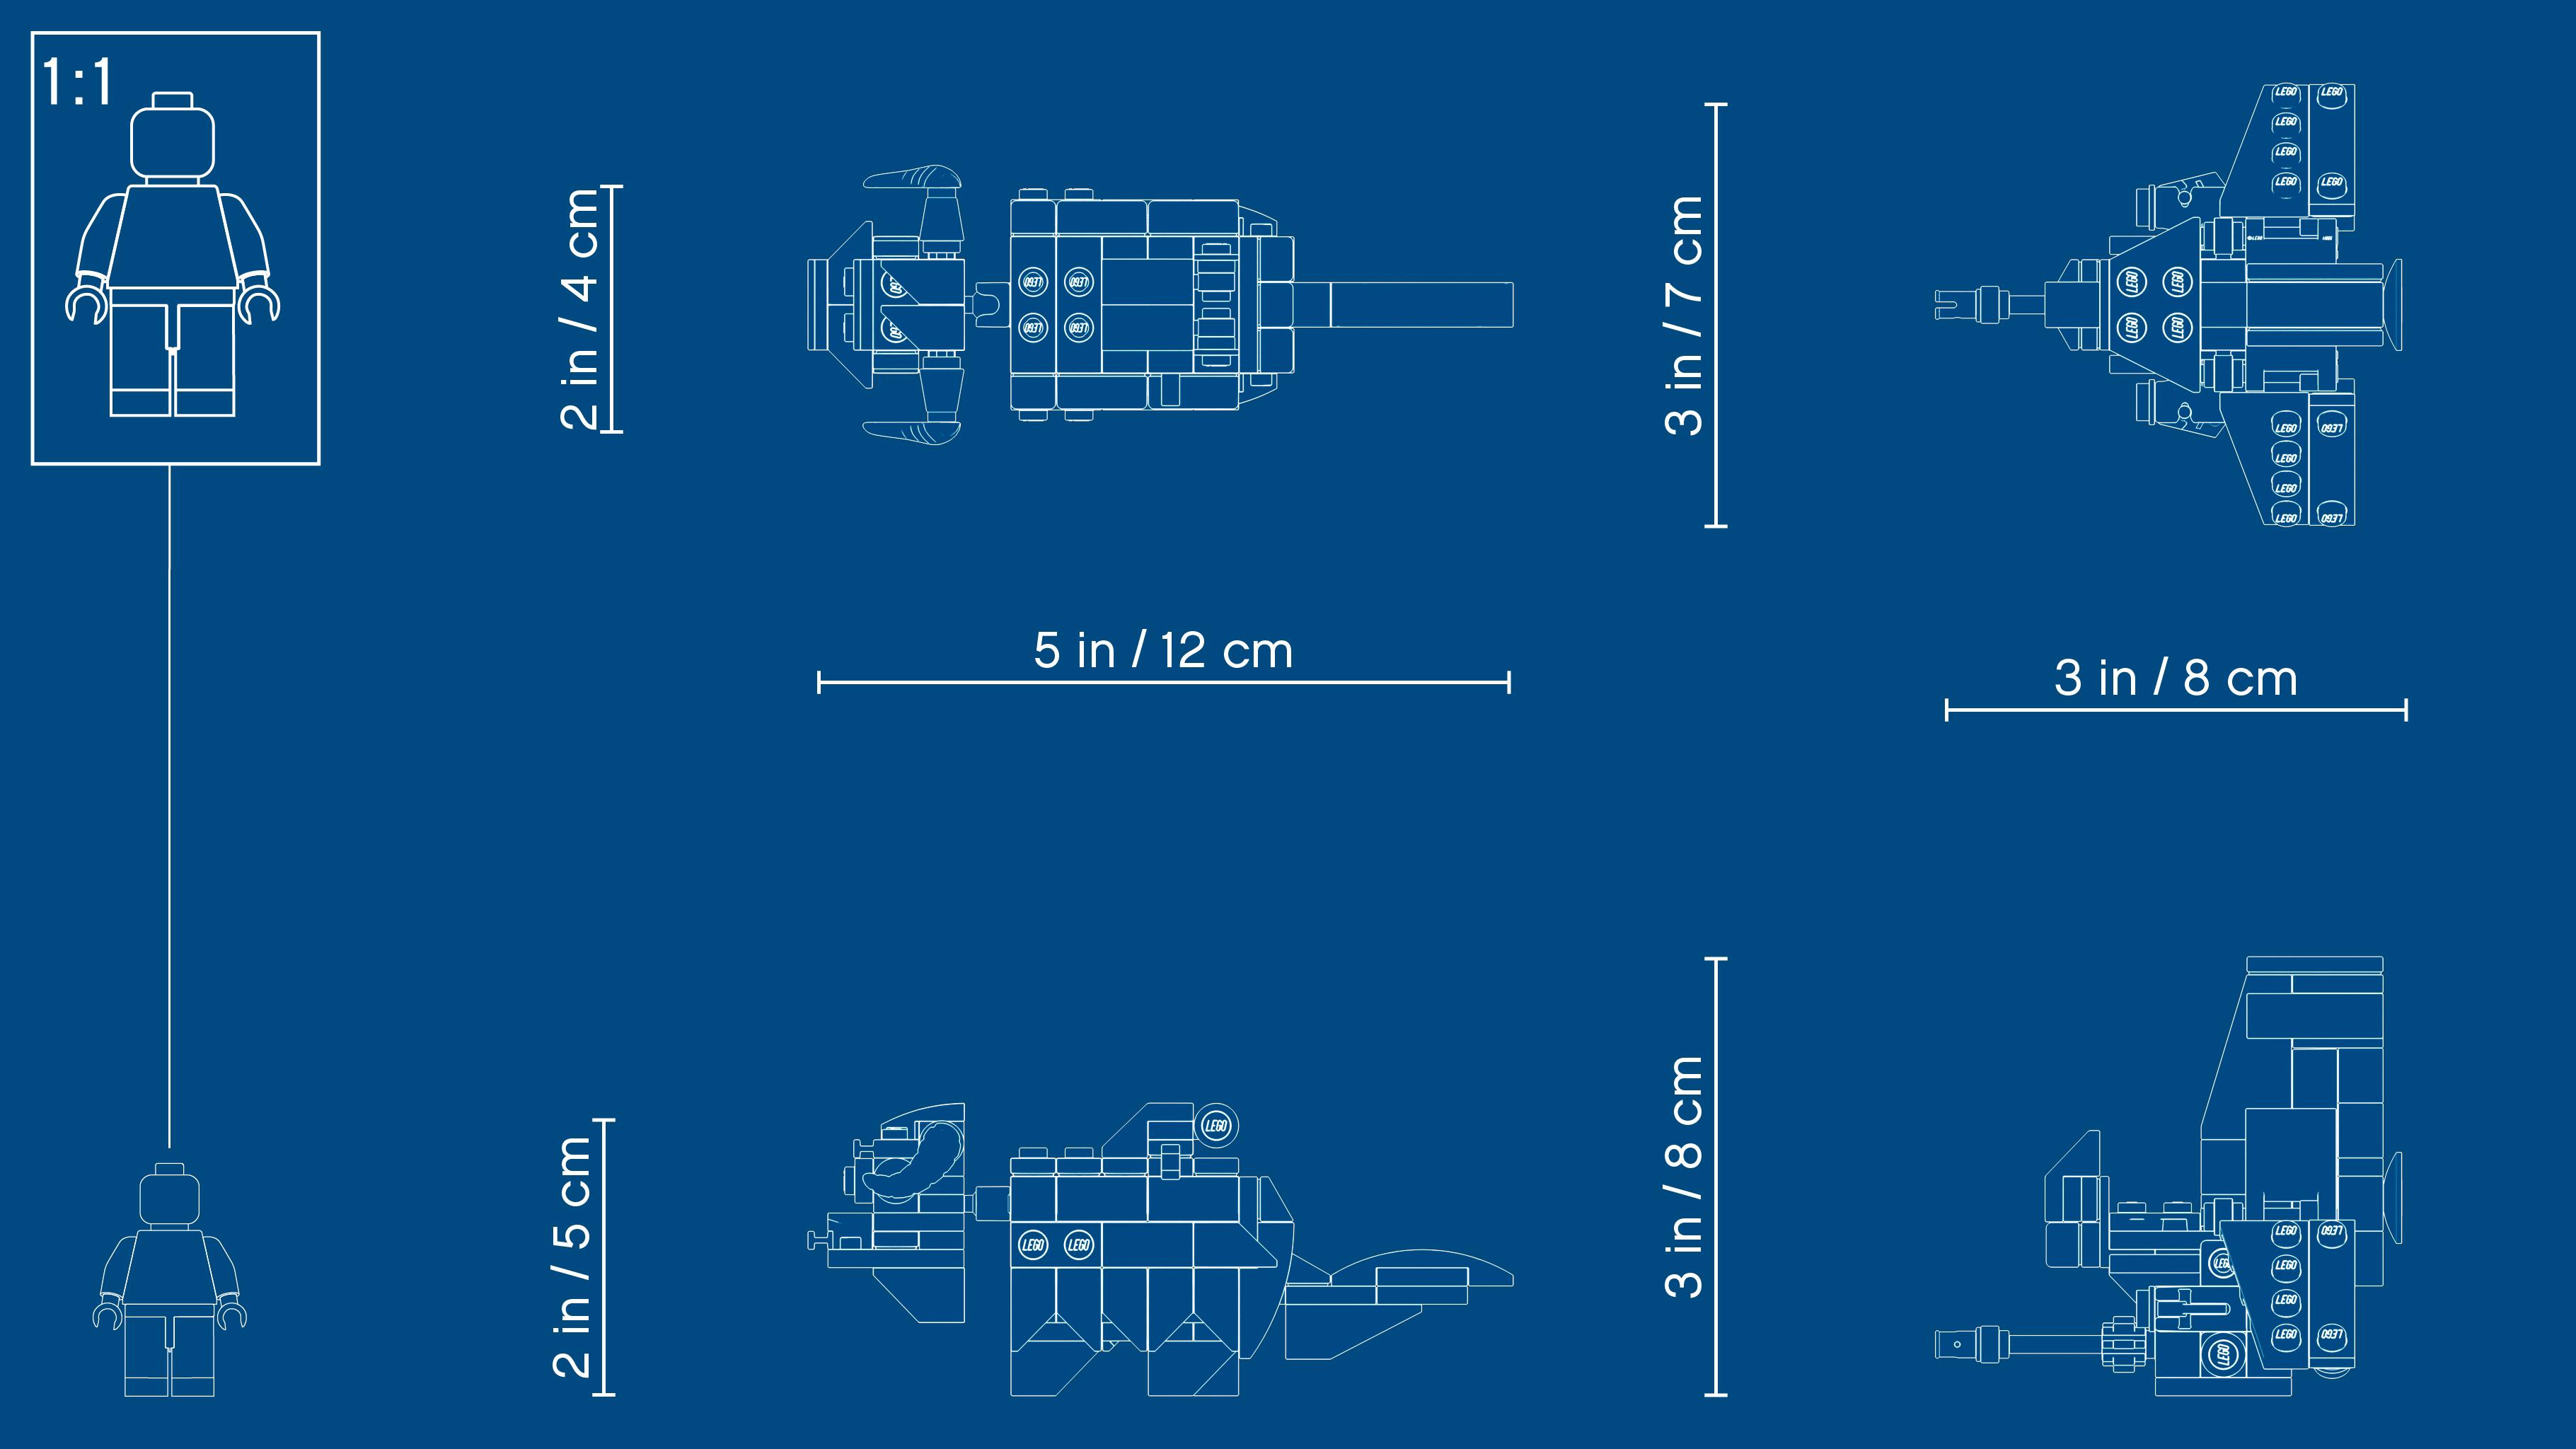 T-16 Skyhopper vs Bantha Microfighters